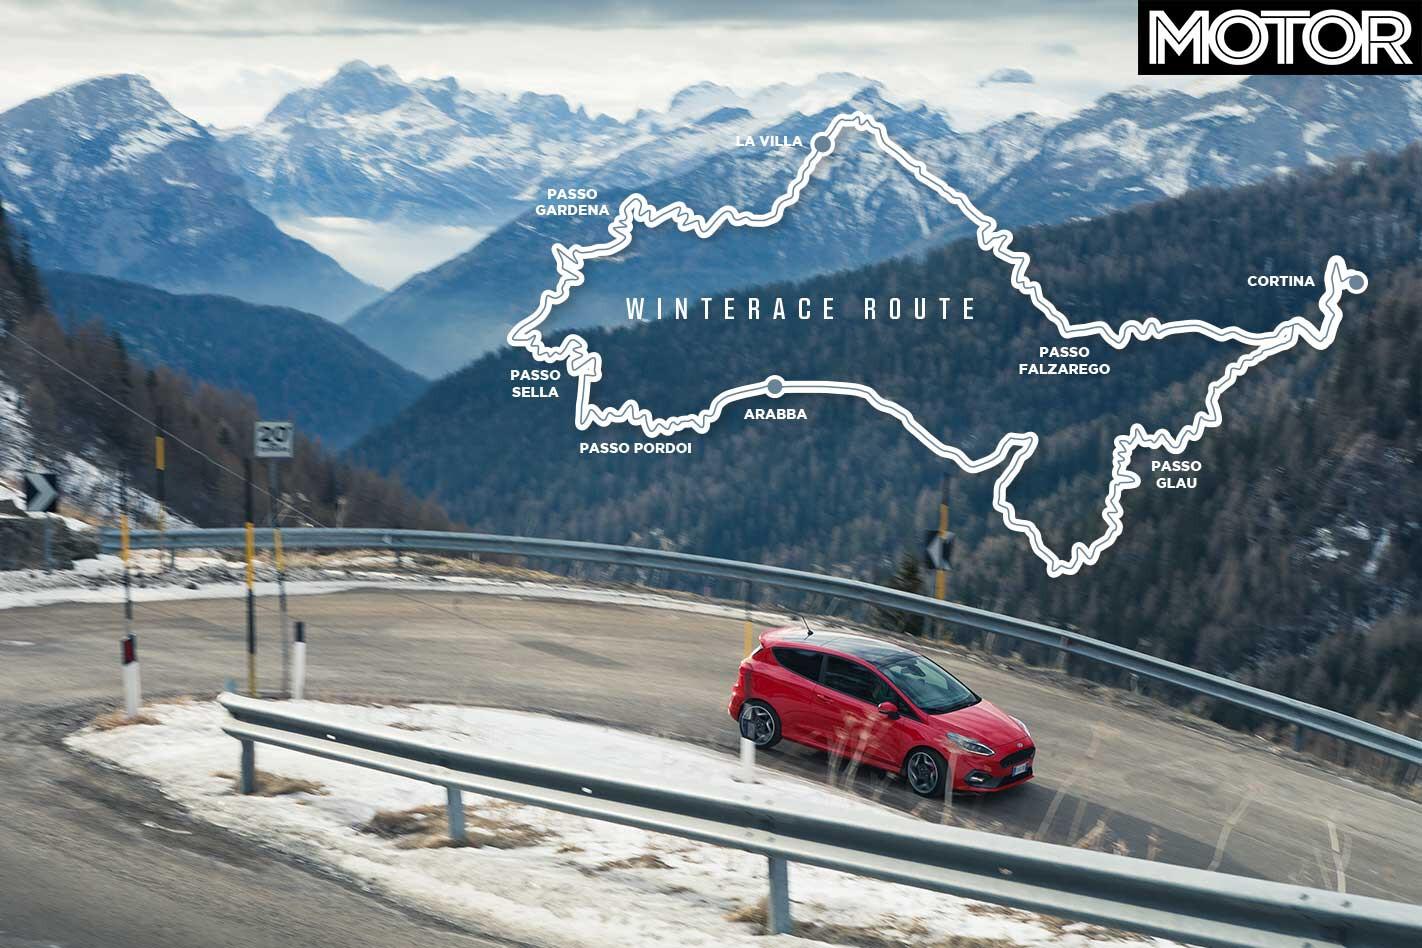 2019 Ford Fiesta ST Alpine Road Route Jpg